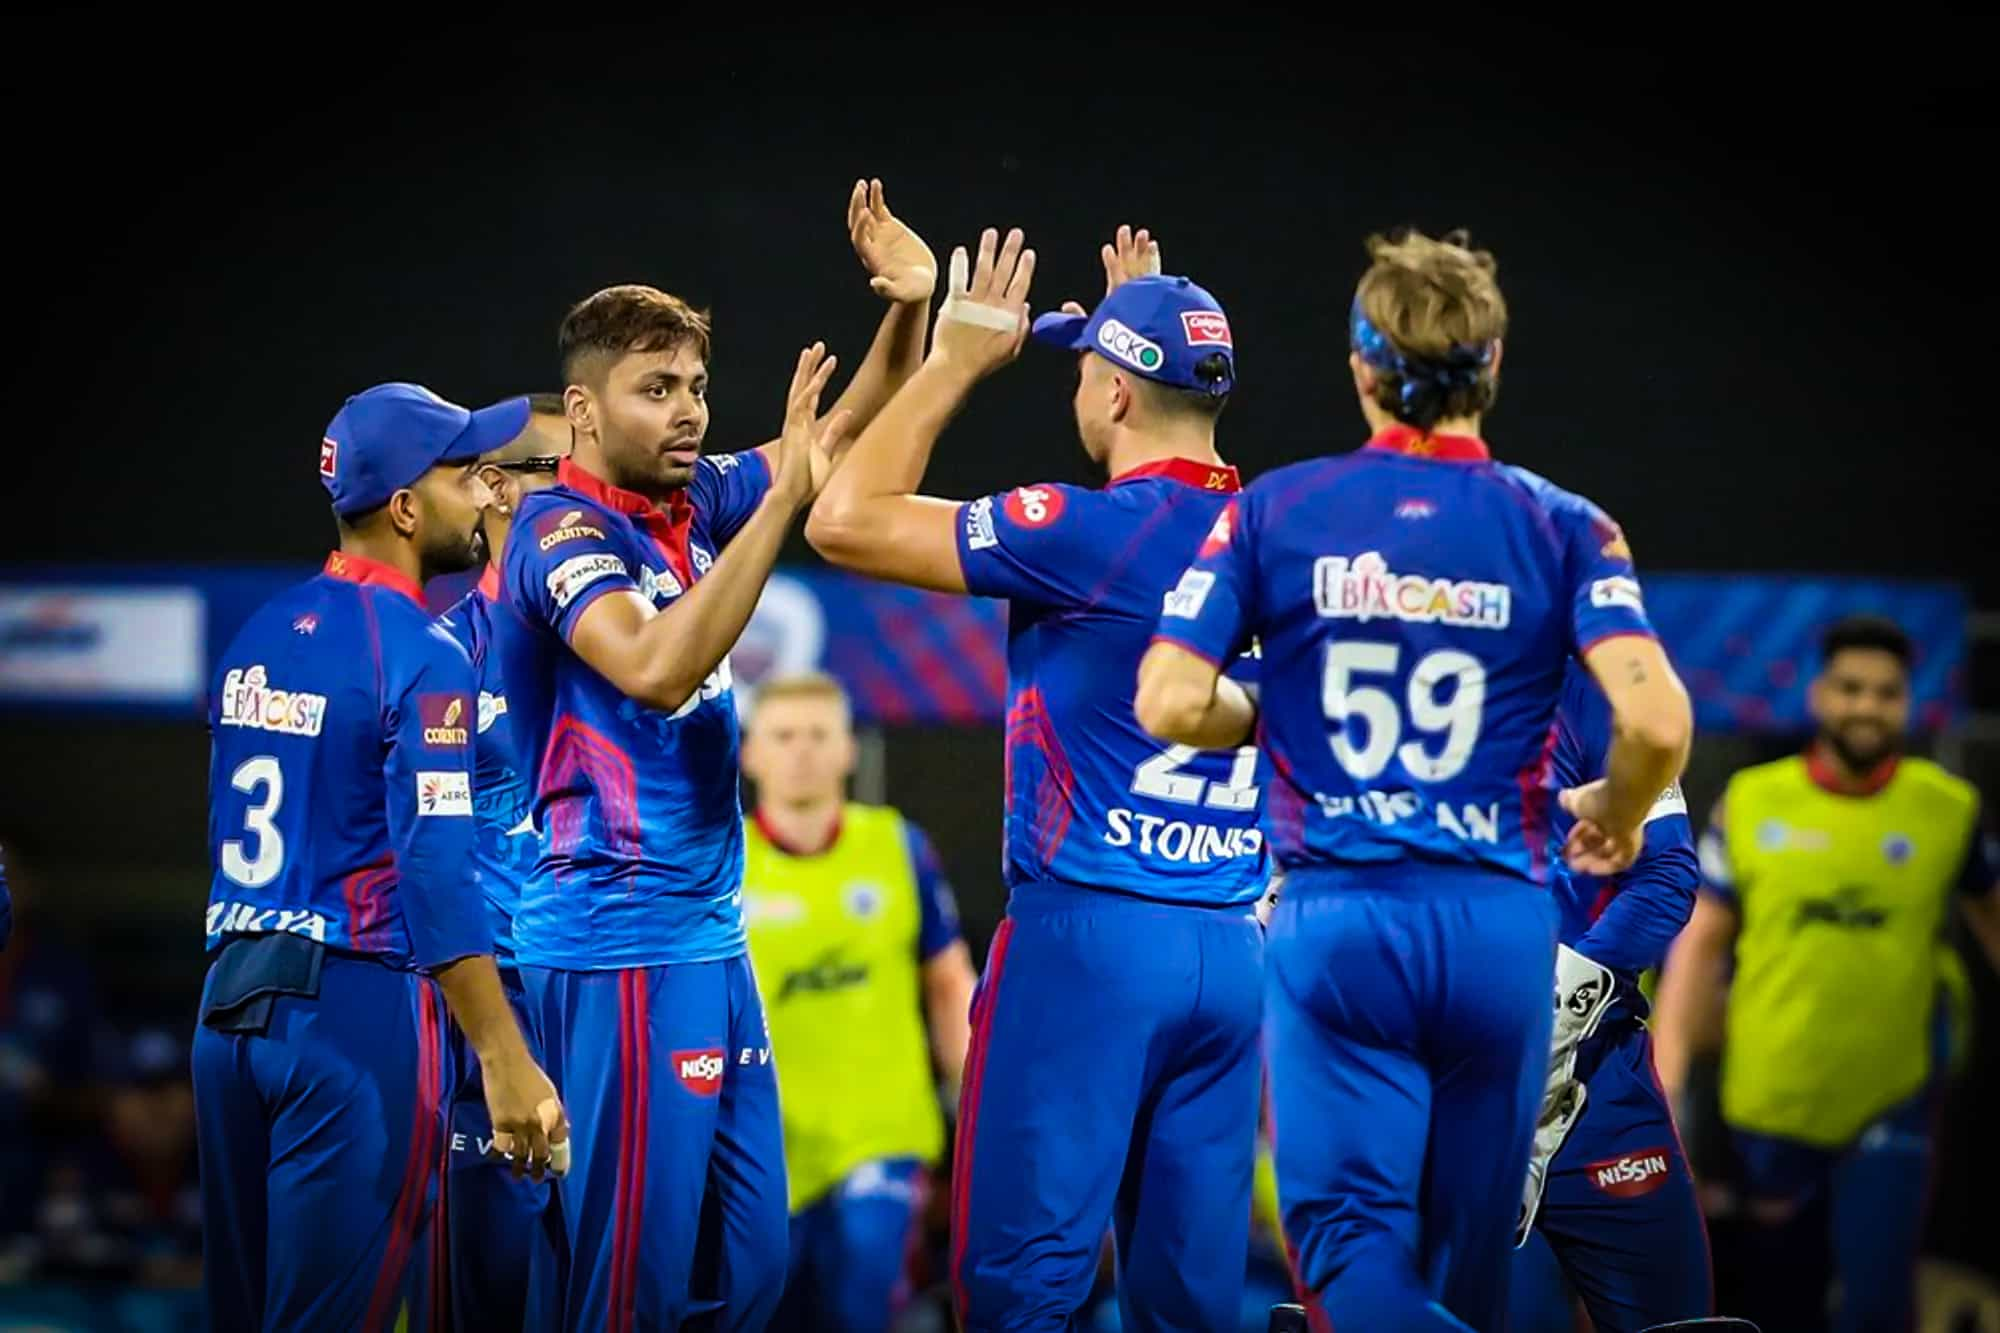 IPL 2021: Delhi Capitals (DC) Updated Squad For 2nd Leg In UAE